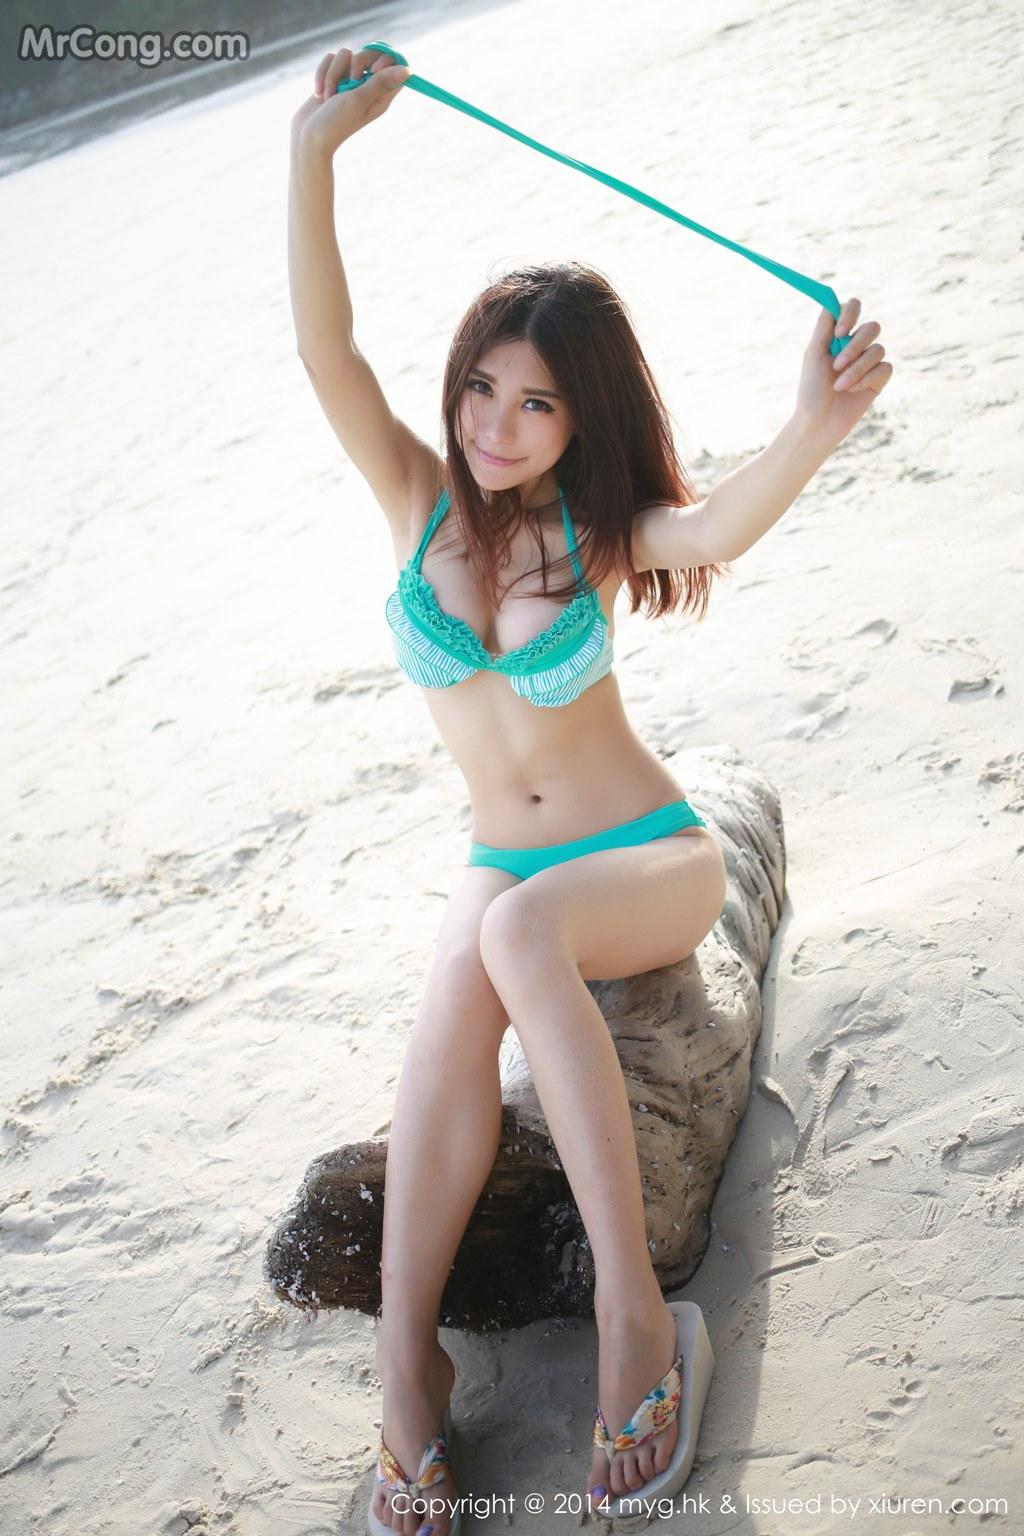 MyGirl Vol.014: Model Ula (绮里嘉) (120P)